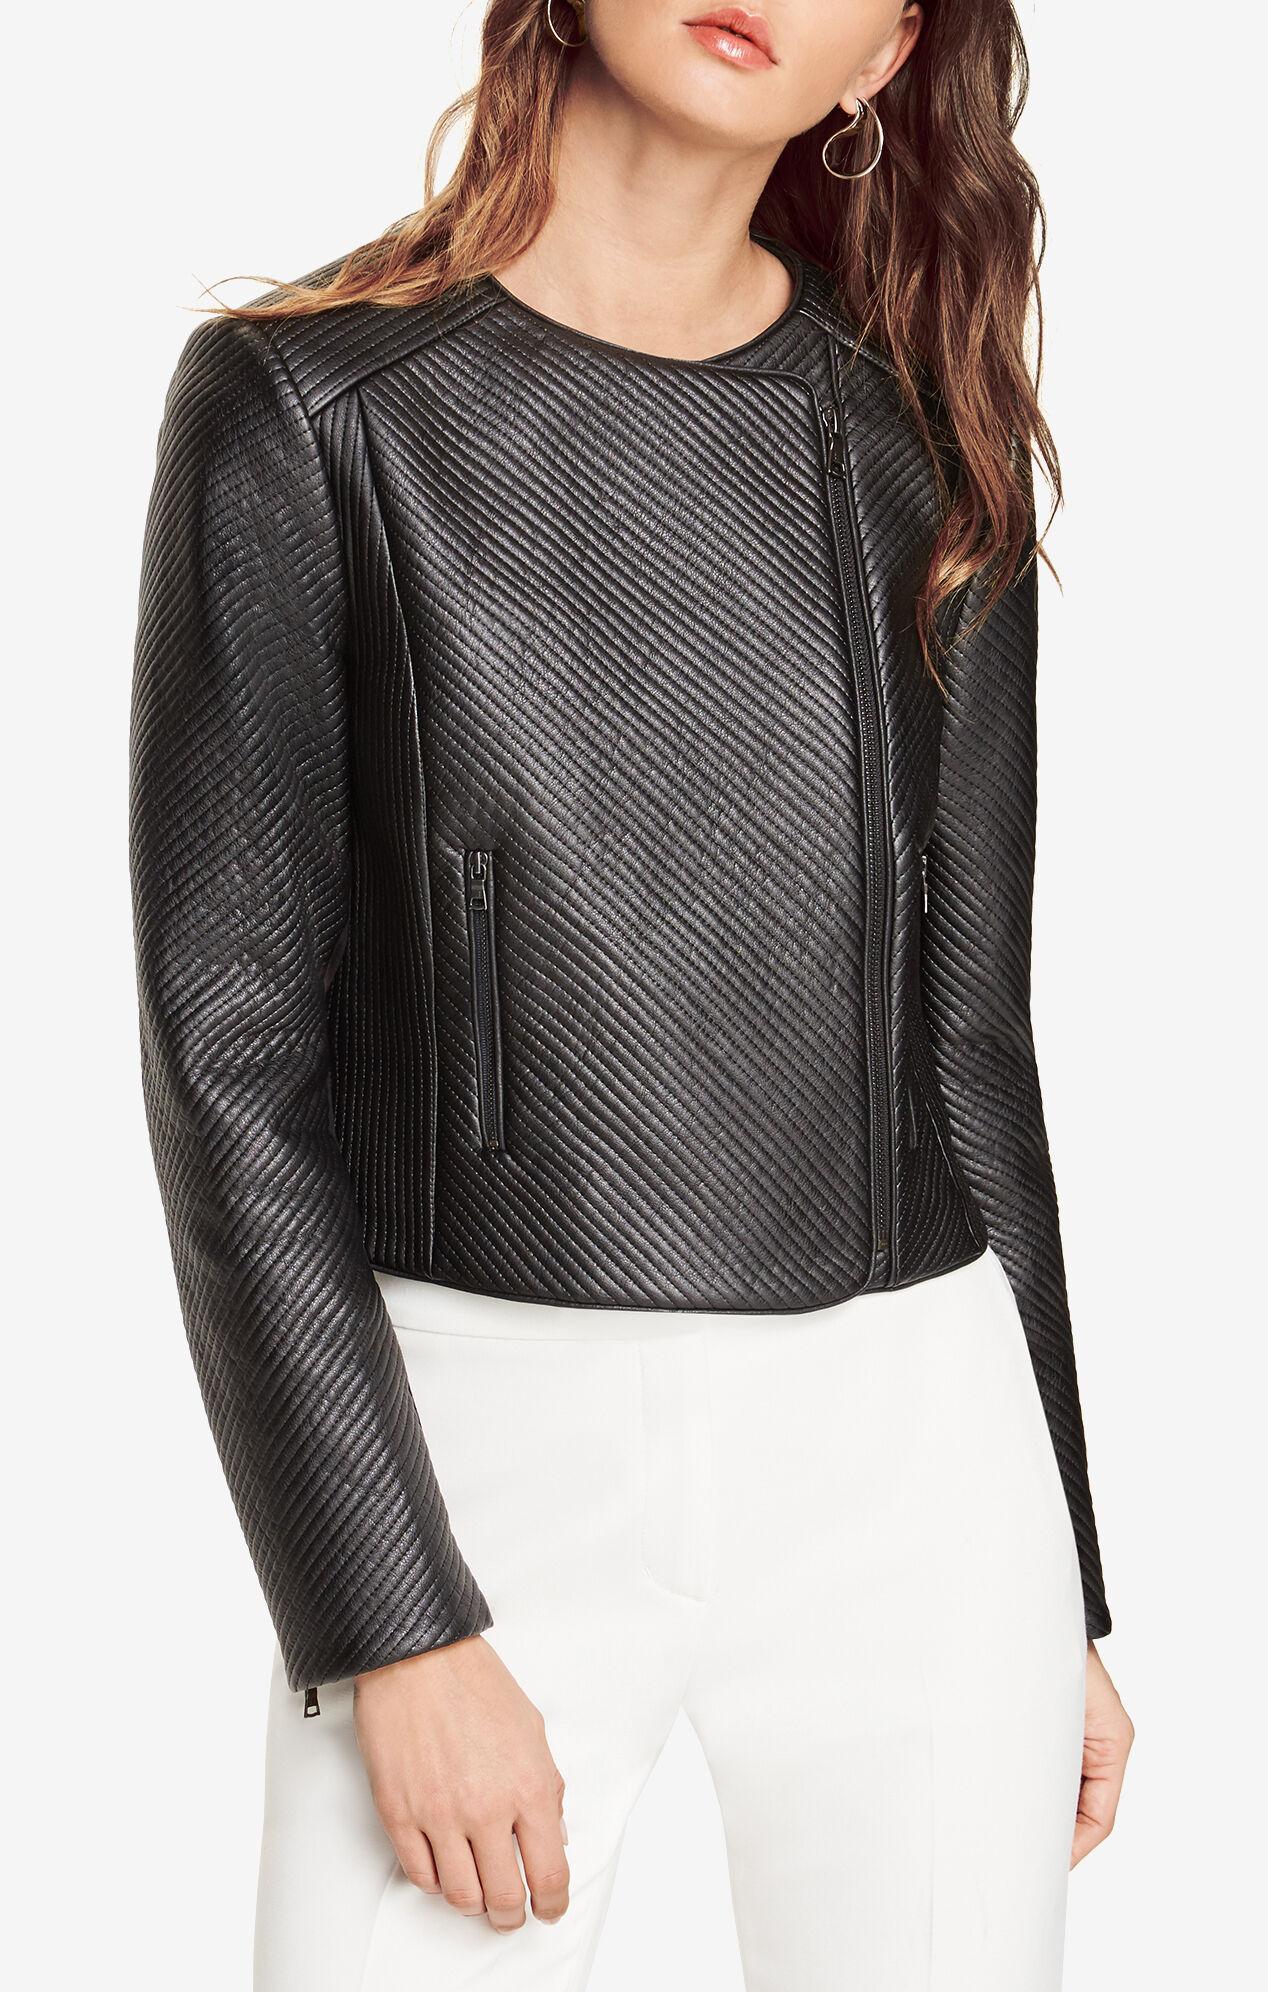 Bryden Faux-Leather Jacket